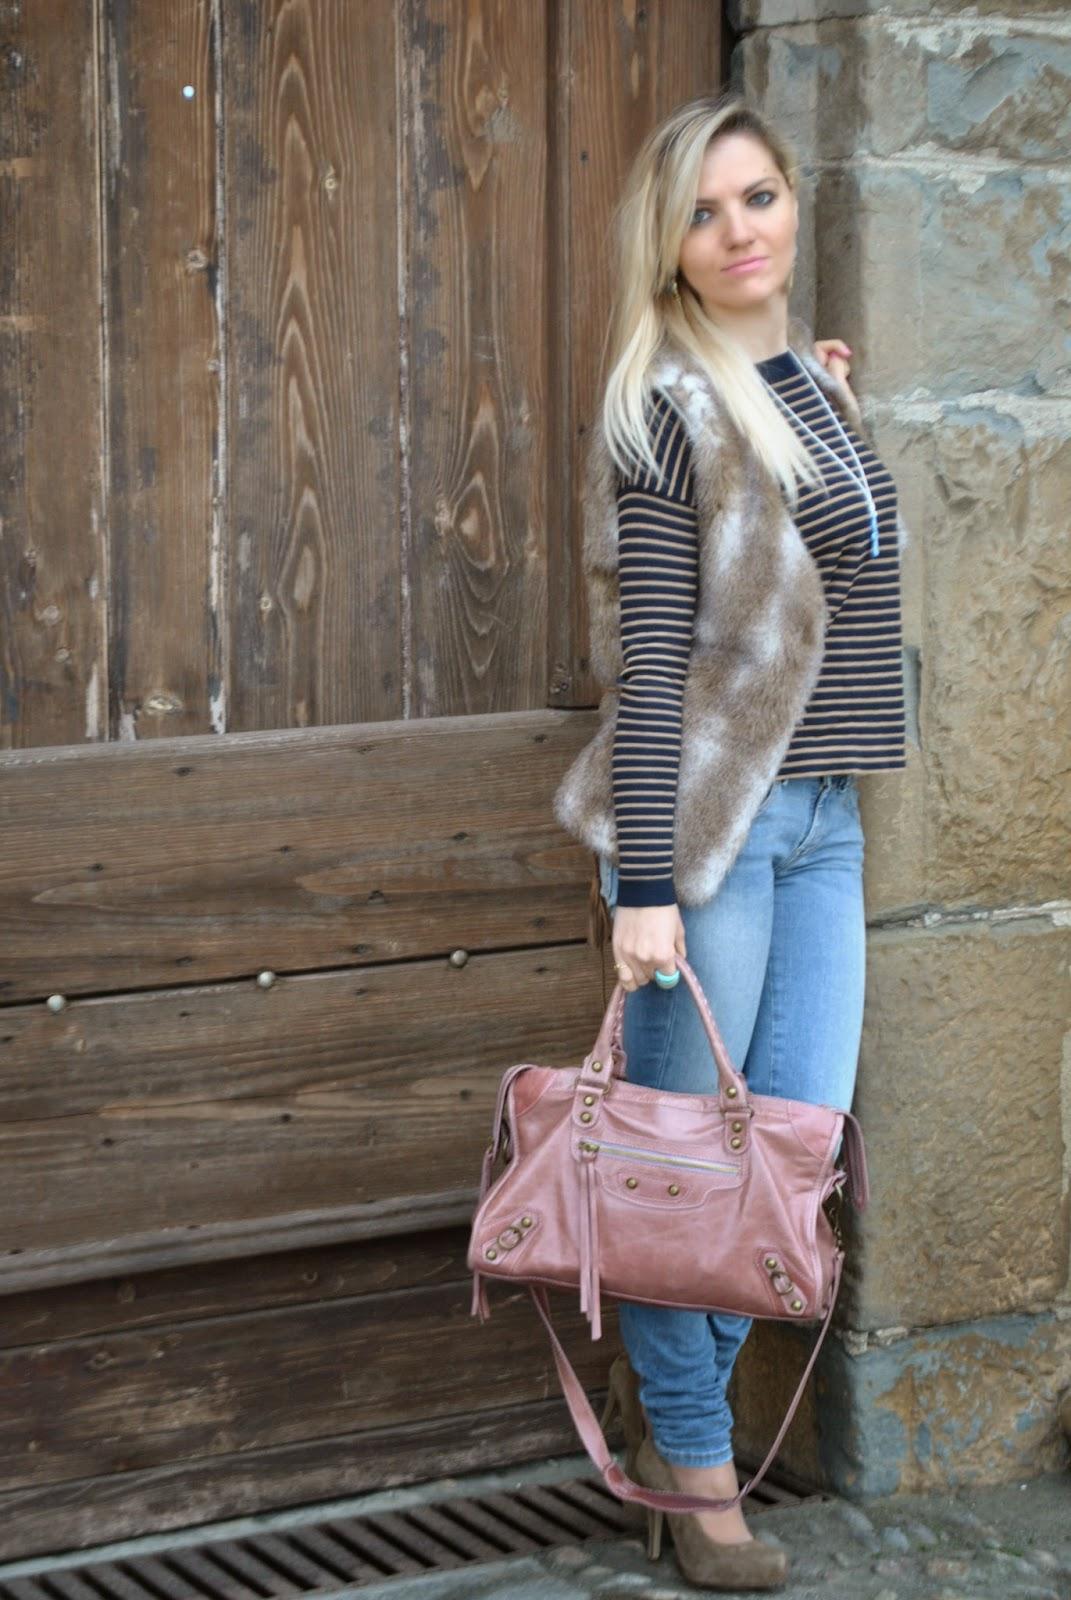 outfit jeans e tacchi, outfit gilet pelliccia, outfit maglia a righe, outfit tino generation, abbinamenti jeans e tacchi, abbinamenti maglia righe, abbinamenti gilet pelliccia, come abbinare il gilet di pelliccia, borsa rosa, come abbinare la borsa rosa, ciondolo tino,  orecchini majique, ragazze bionde, jeans fornarina, maglia mango, anello la murrina, fashion blogger italiane, mariafelicia magno fashion blogger, colorblock by felym, fashion blog italiani, outfit mariafelicia magno, italian girl, fashion bloggers italy, blonde girls, outfit gennaio 2015, outfit invernali, how to wear fur vest, jeans and heels, outfit jeans e tacchi, outfit gilet pelliccia, outfit maglia a righe, outfit tino generation, abbinamenti jeans e tacchi, abbinamenti maglia righe, abbinamenti gilet pelliccia, come abbinare il gilet di pelliccia, borsa rosa, come abbinare la borsa rosa, ciondolo tino,  orecchini majique, ragazze bionde jeans fornarina maglia mango anello la murrina fashion blogger italiane mariafelicia magno fashion blogger colorblock by felym fashion blog italiani outfit, mariafelicia magno, italian girl, fashion bloggers italy, blonde girls, outfit gennaio 2015, outfit invernali, how to wear fur vest, jeans and heels